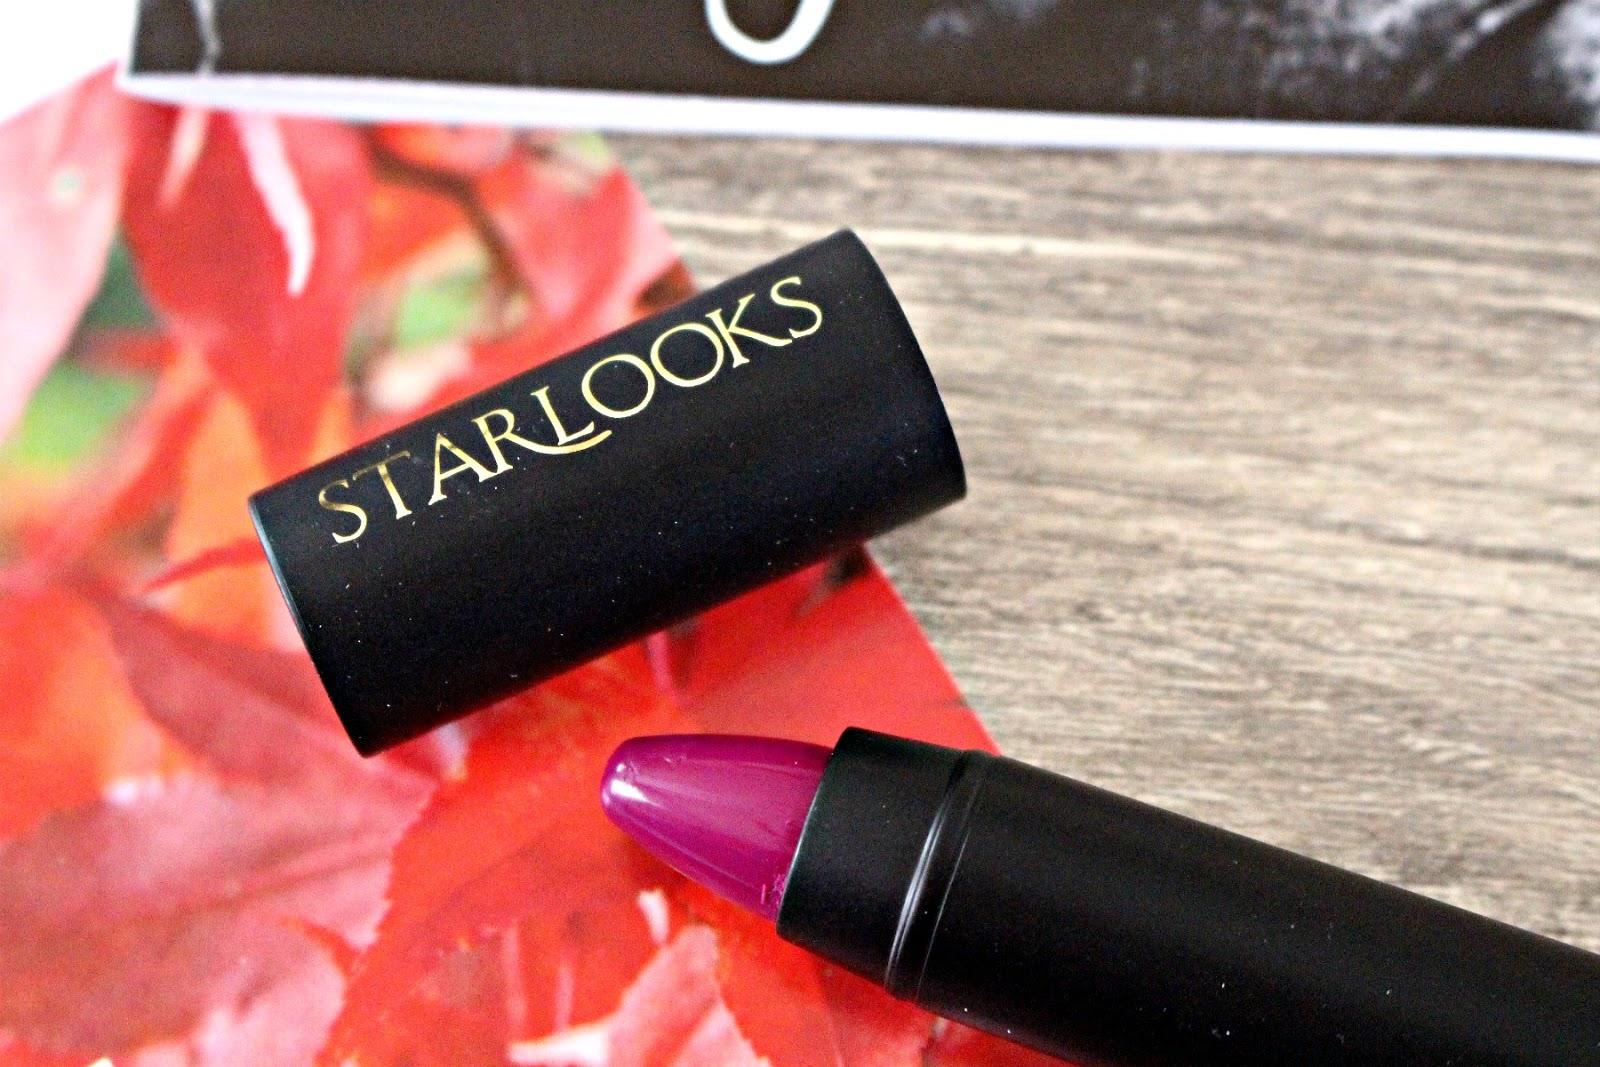 Starlooks lip crayon in Majesty